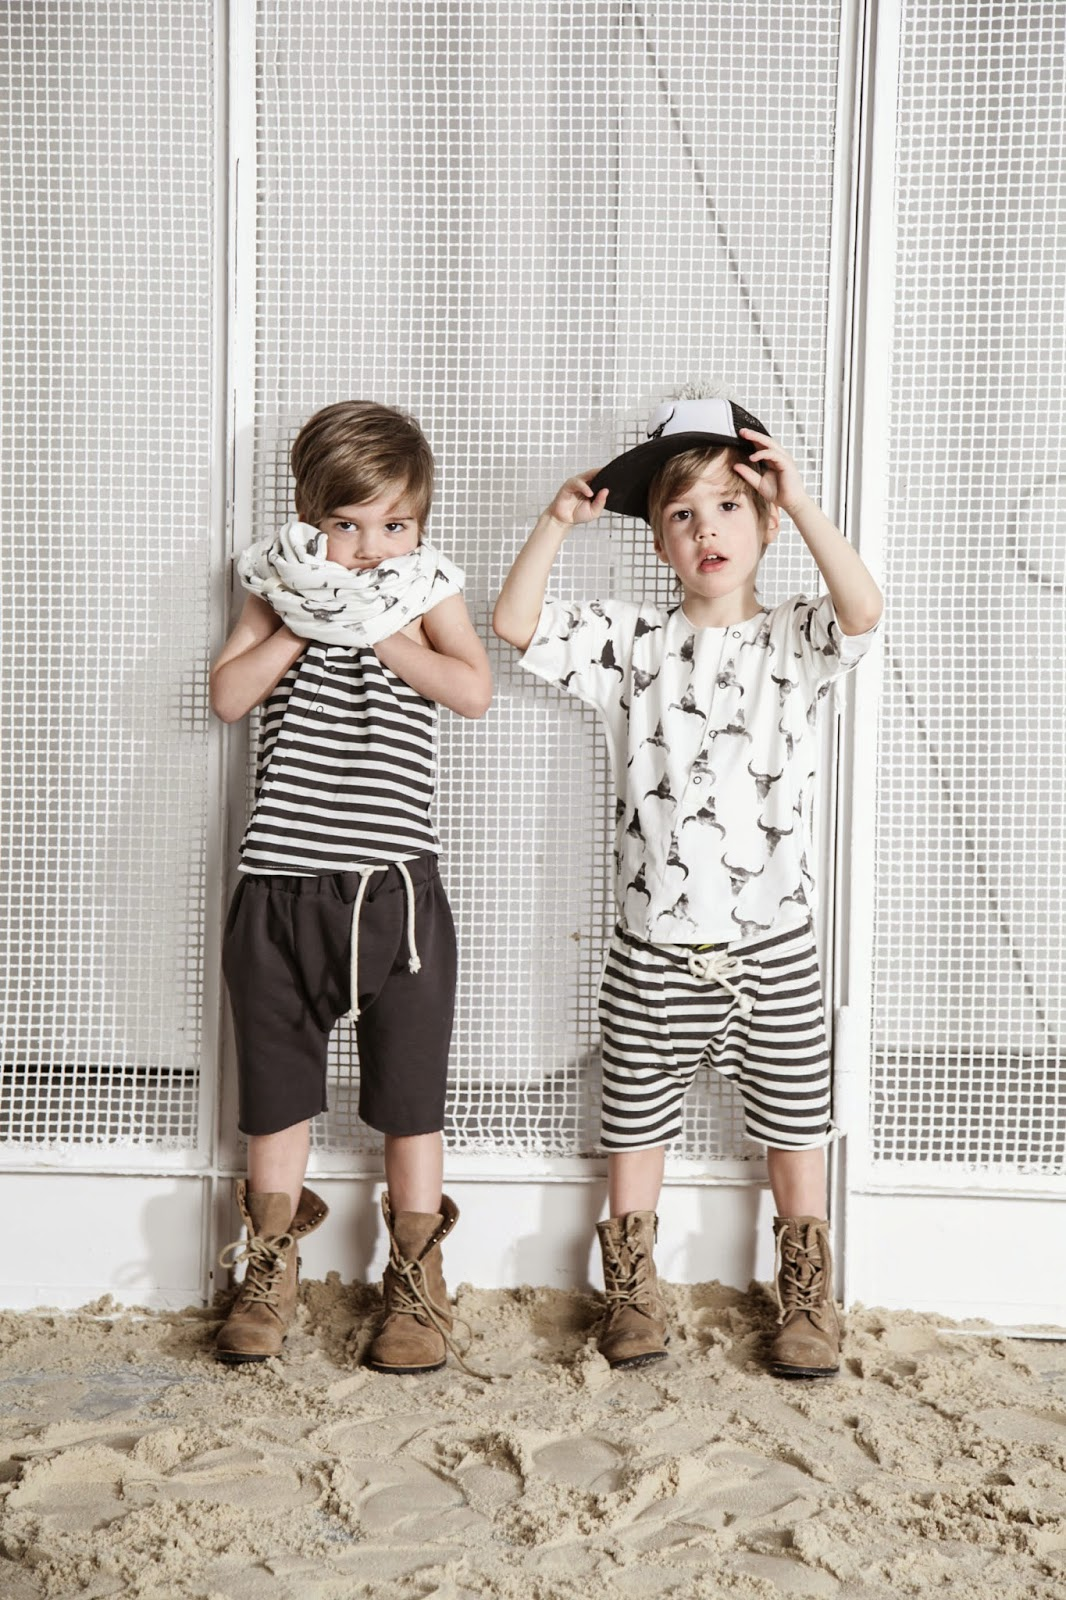 Kloo by Booso - Polish kids fashion spring-summer 2015 - boys style